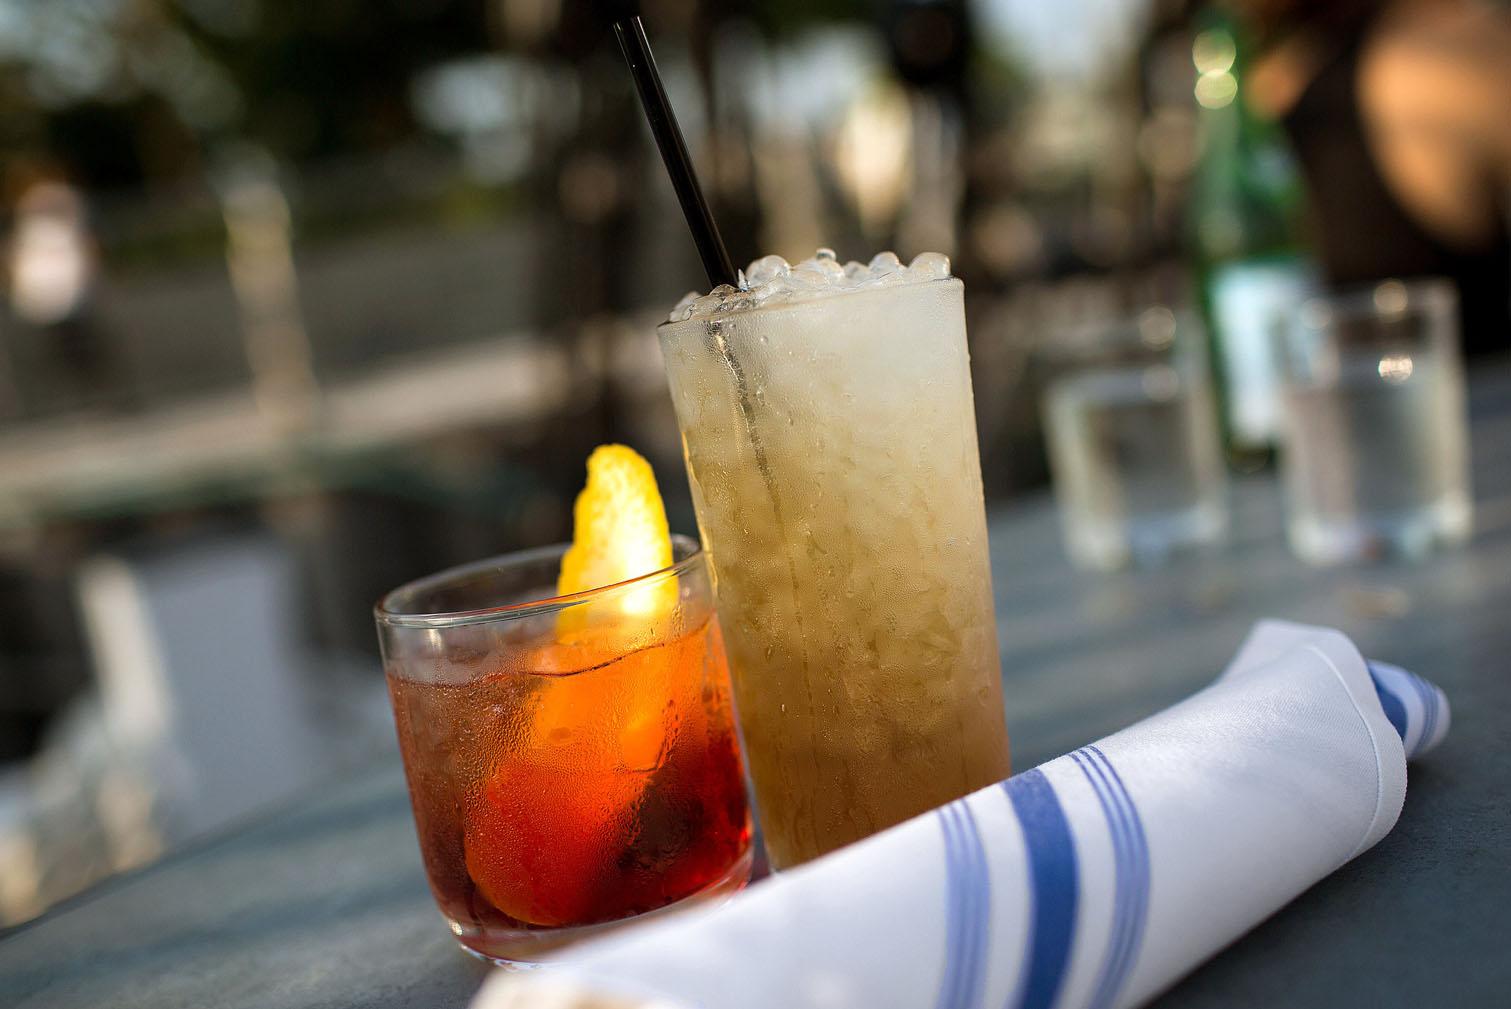 Cocktails include the Negroni Sbagliato and the Kona Swizzle.